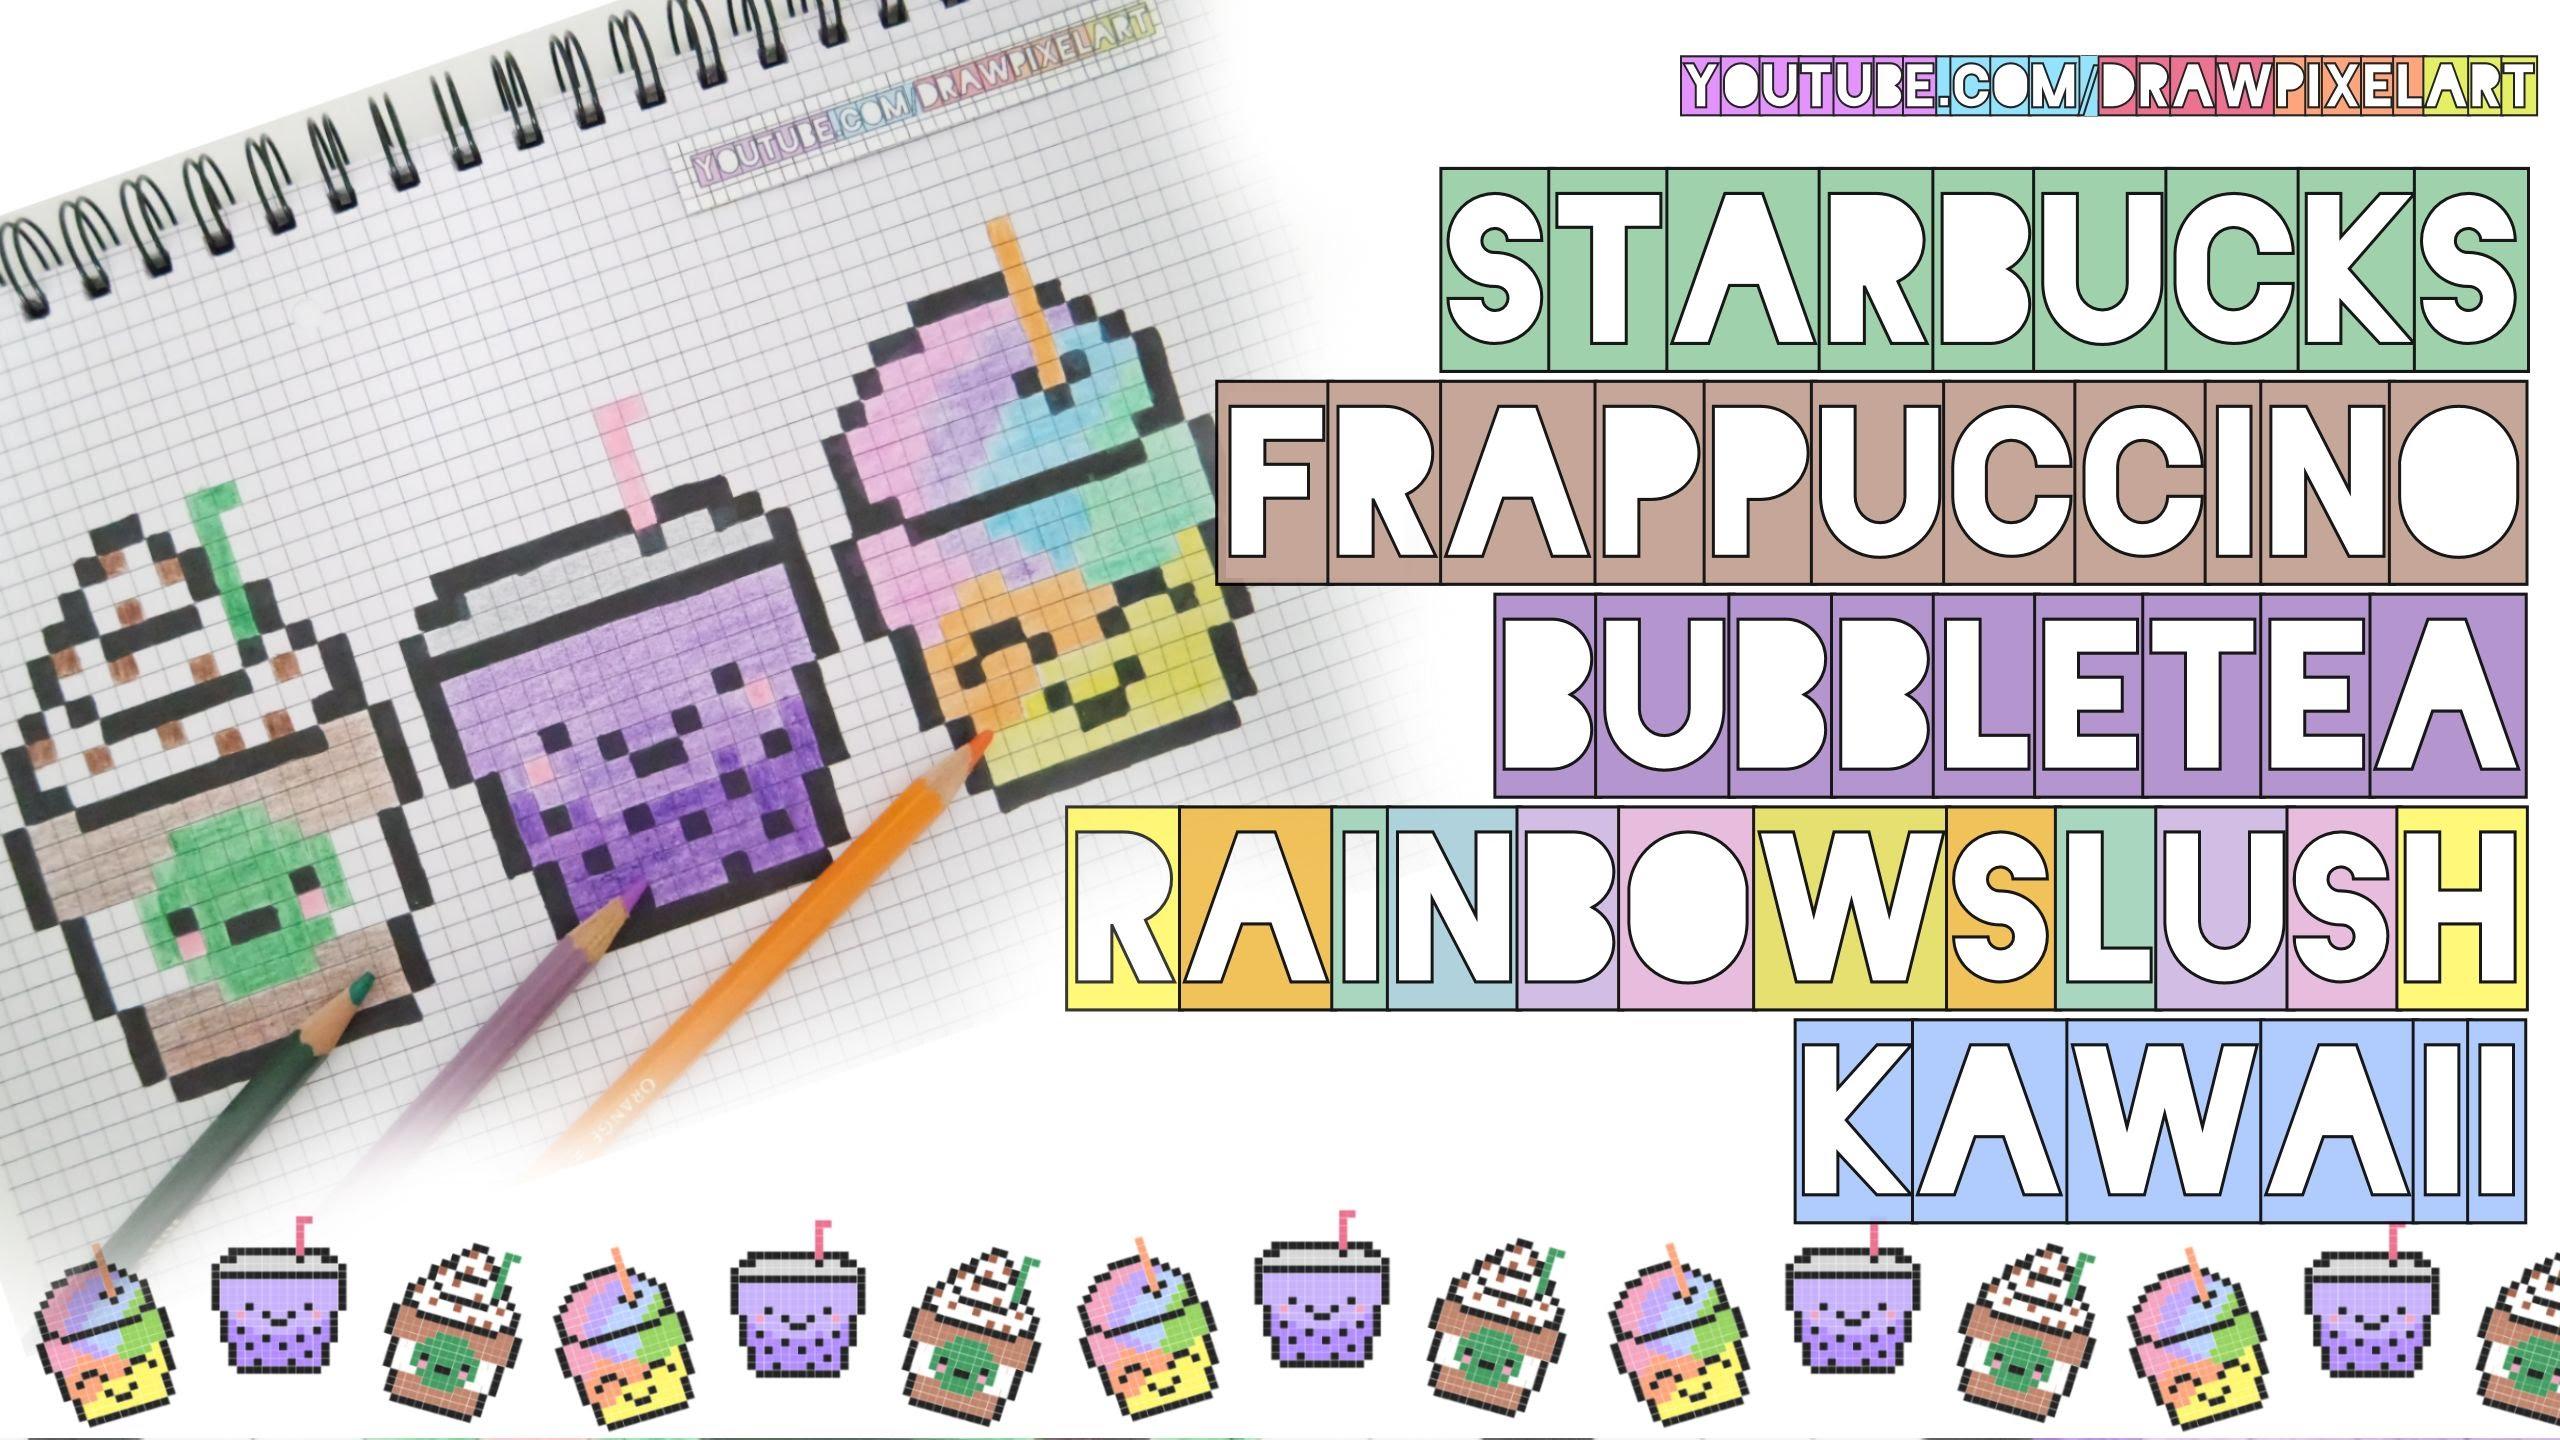 Drawn pixel art bubble Tea handmade to rainbow how